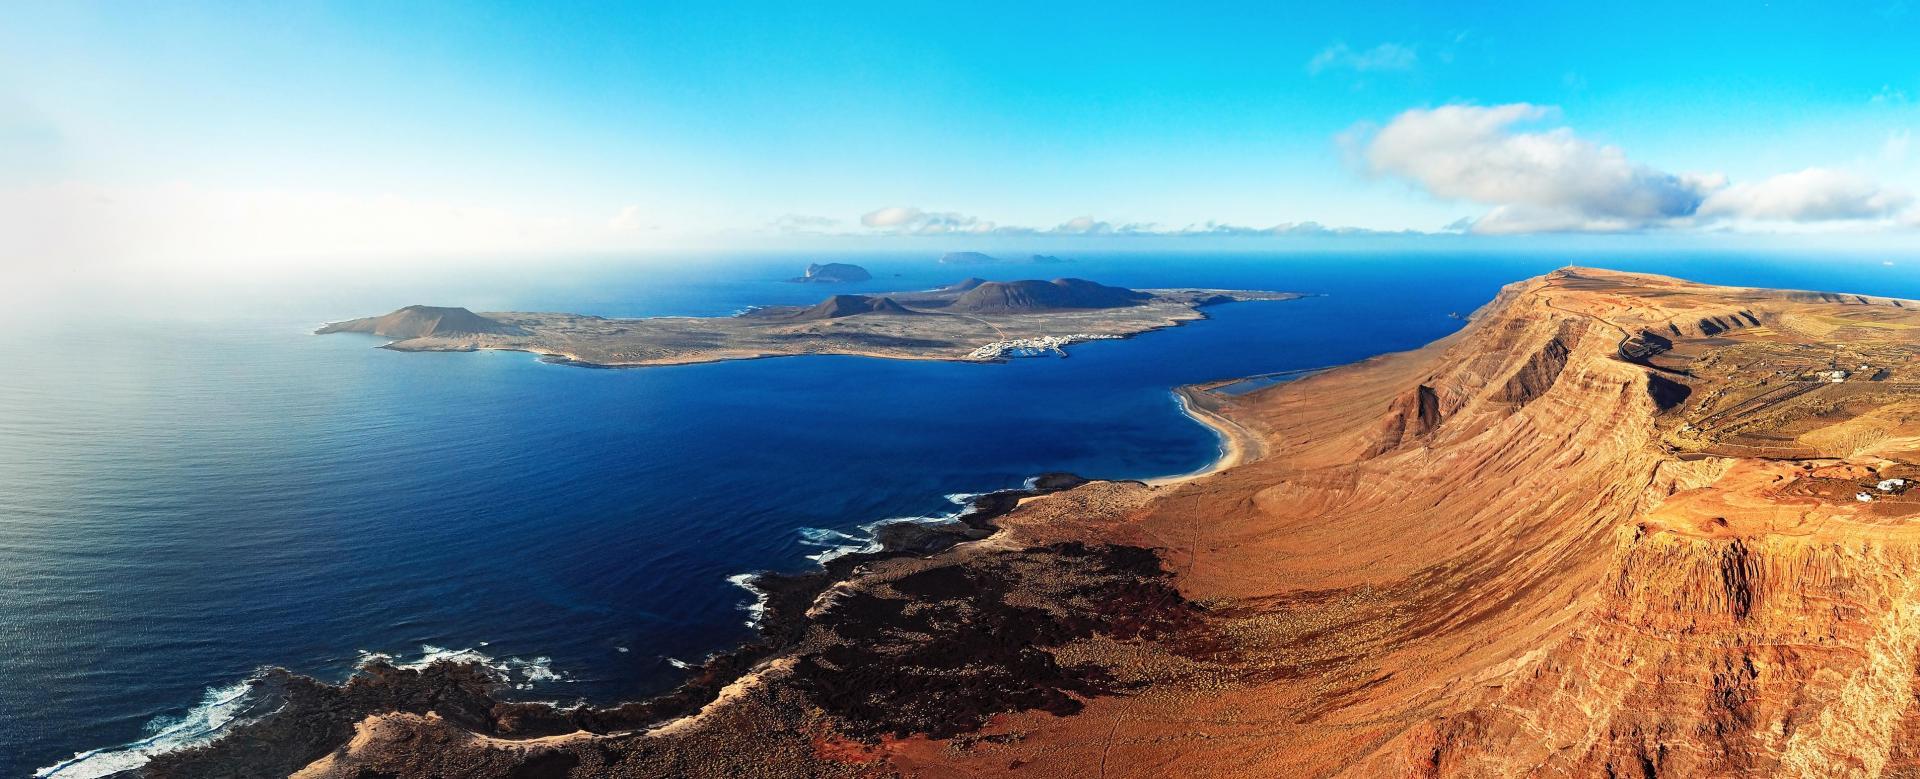 Voyage à pied Espagne : Fuerteventura et lanzarote